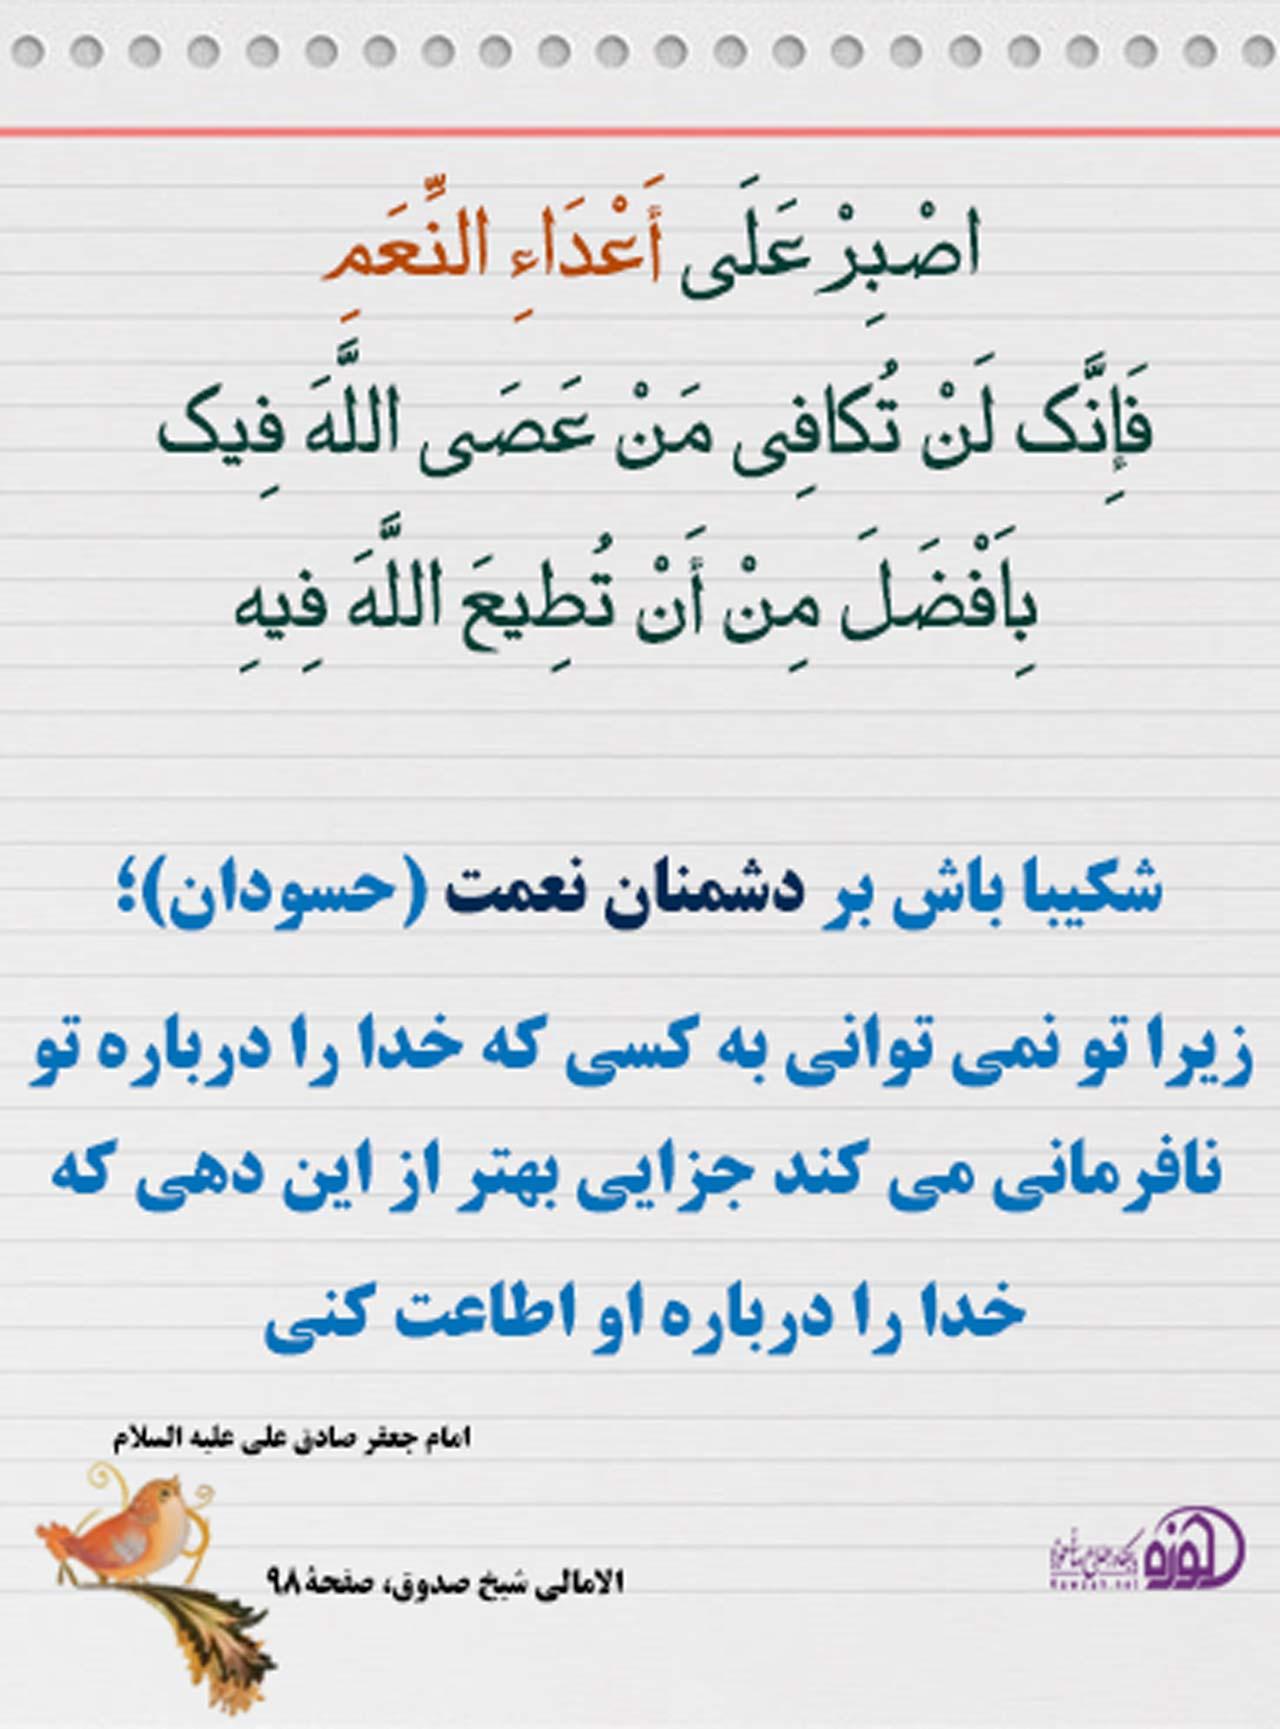 http://www.hawzah.net/Image/telegram/hadith-94-11-21.jpg